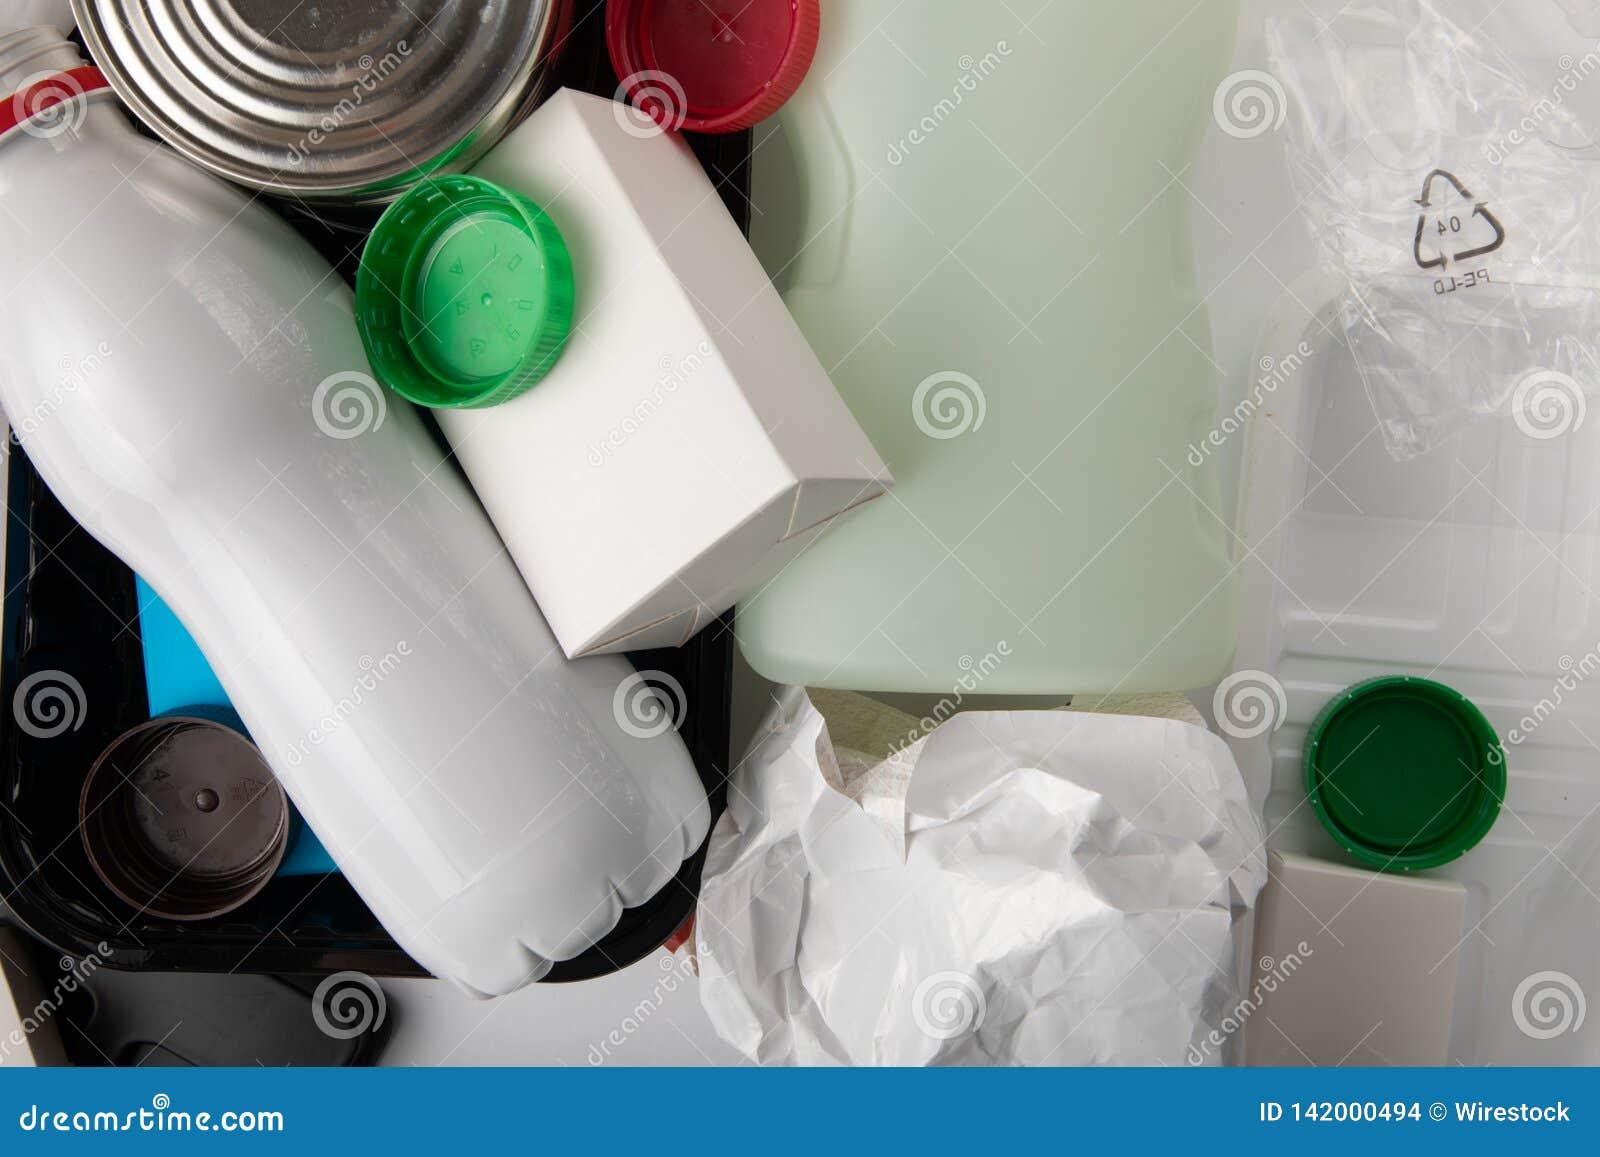 Reciclaje de la basura médica